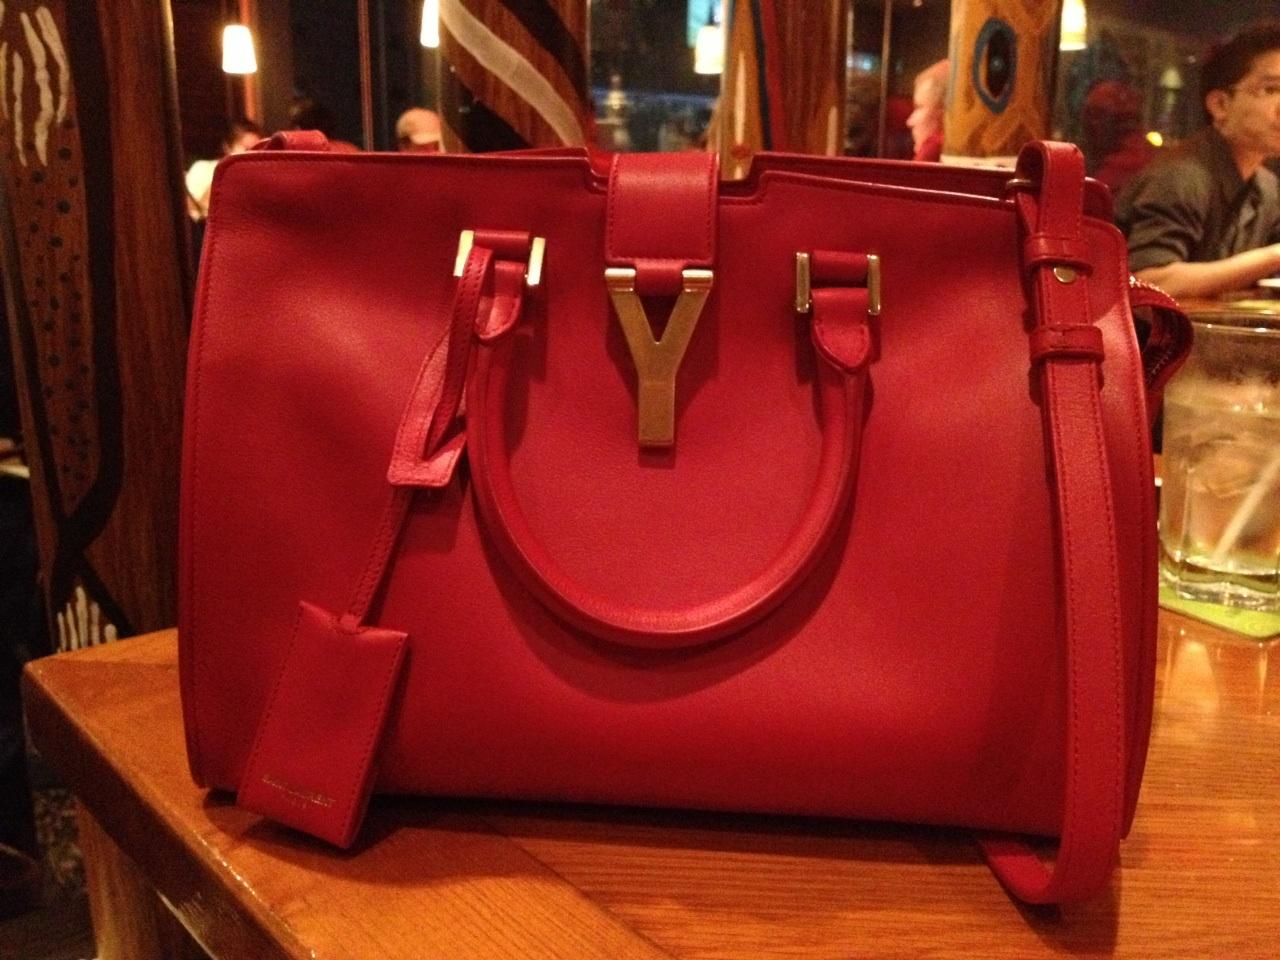 CR ????? speedy, NF and Saffiano ??? YSL mini Cabas ChYc bag ???????